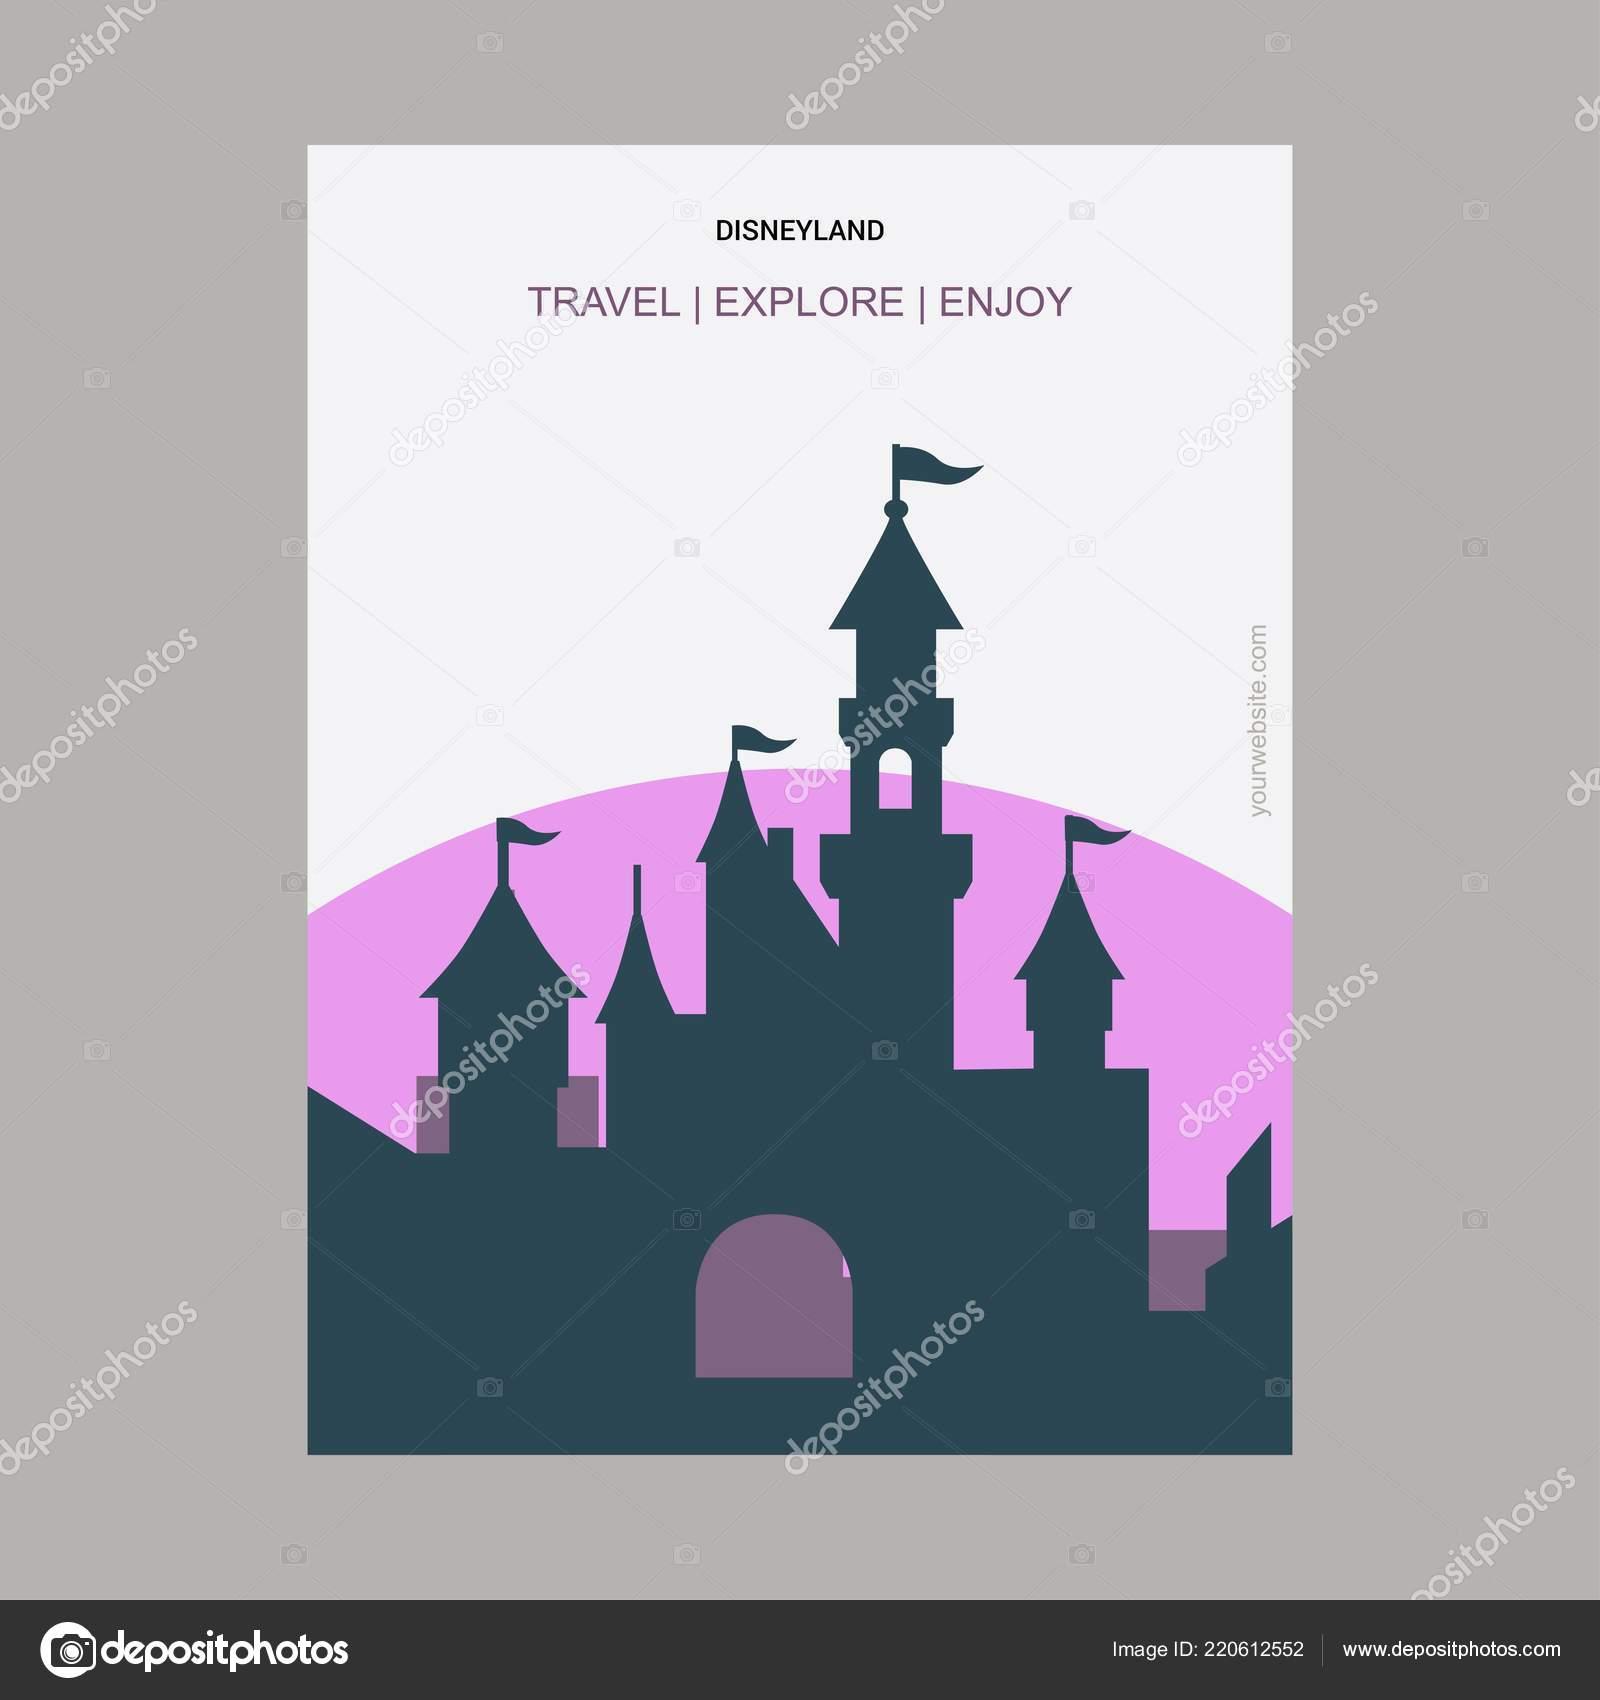 Disneyland California United States Vintage Style Landmark Poster